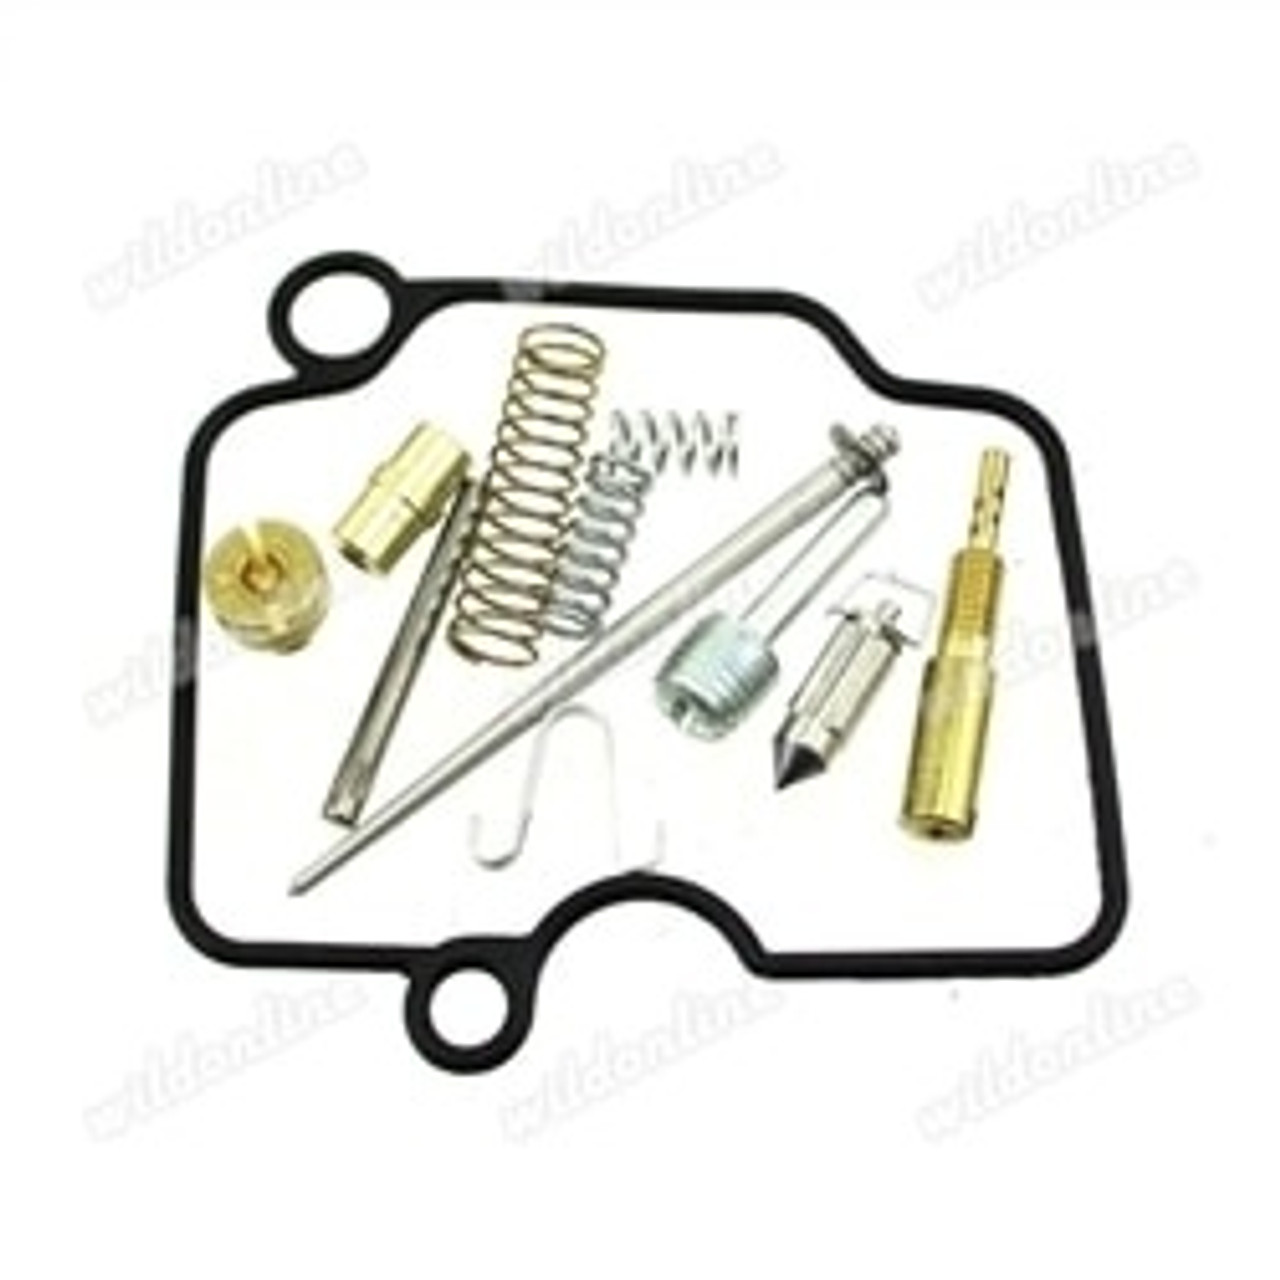 22mm Mikuni Small Body Carb Rebuild Kit